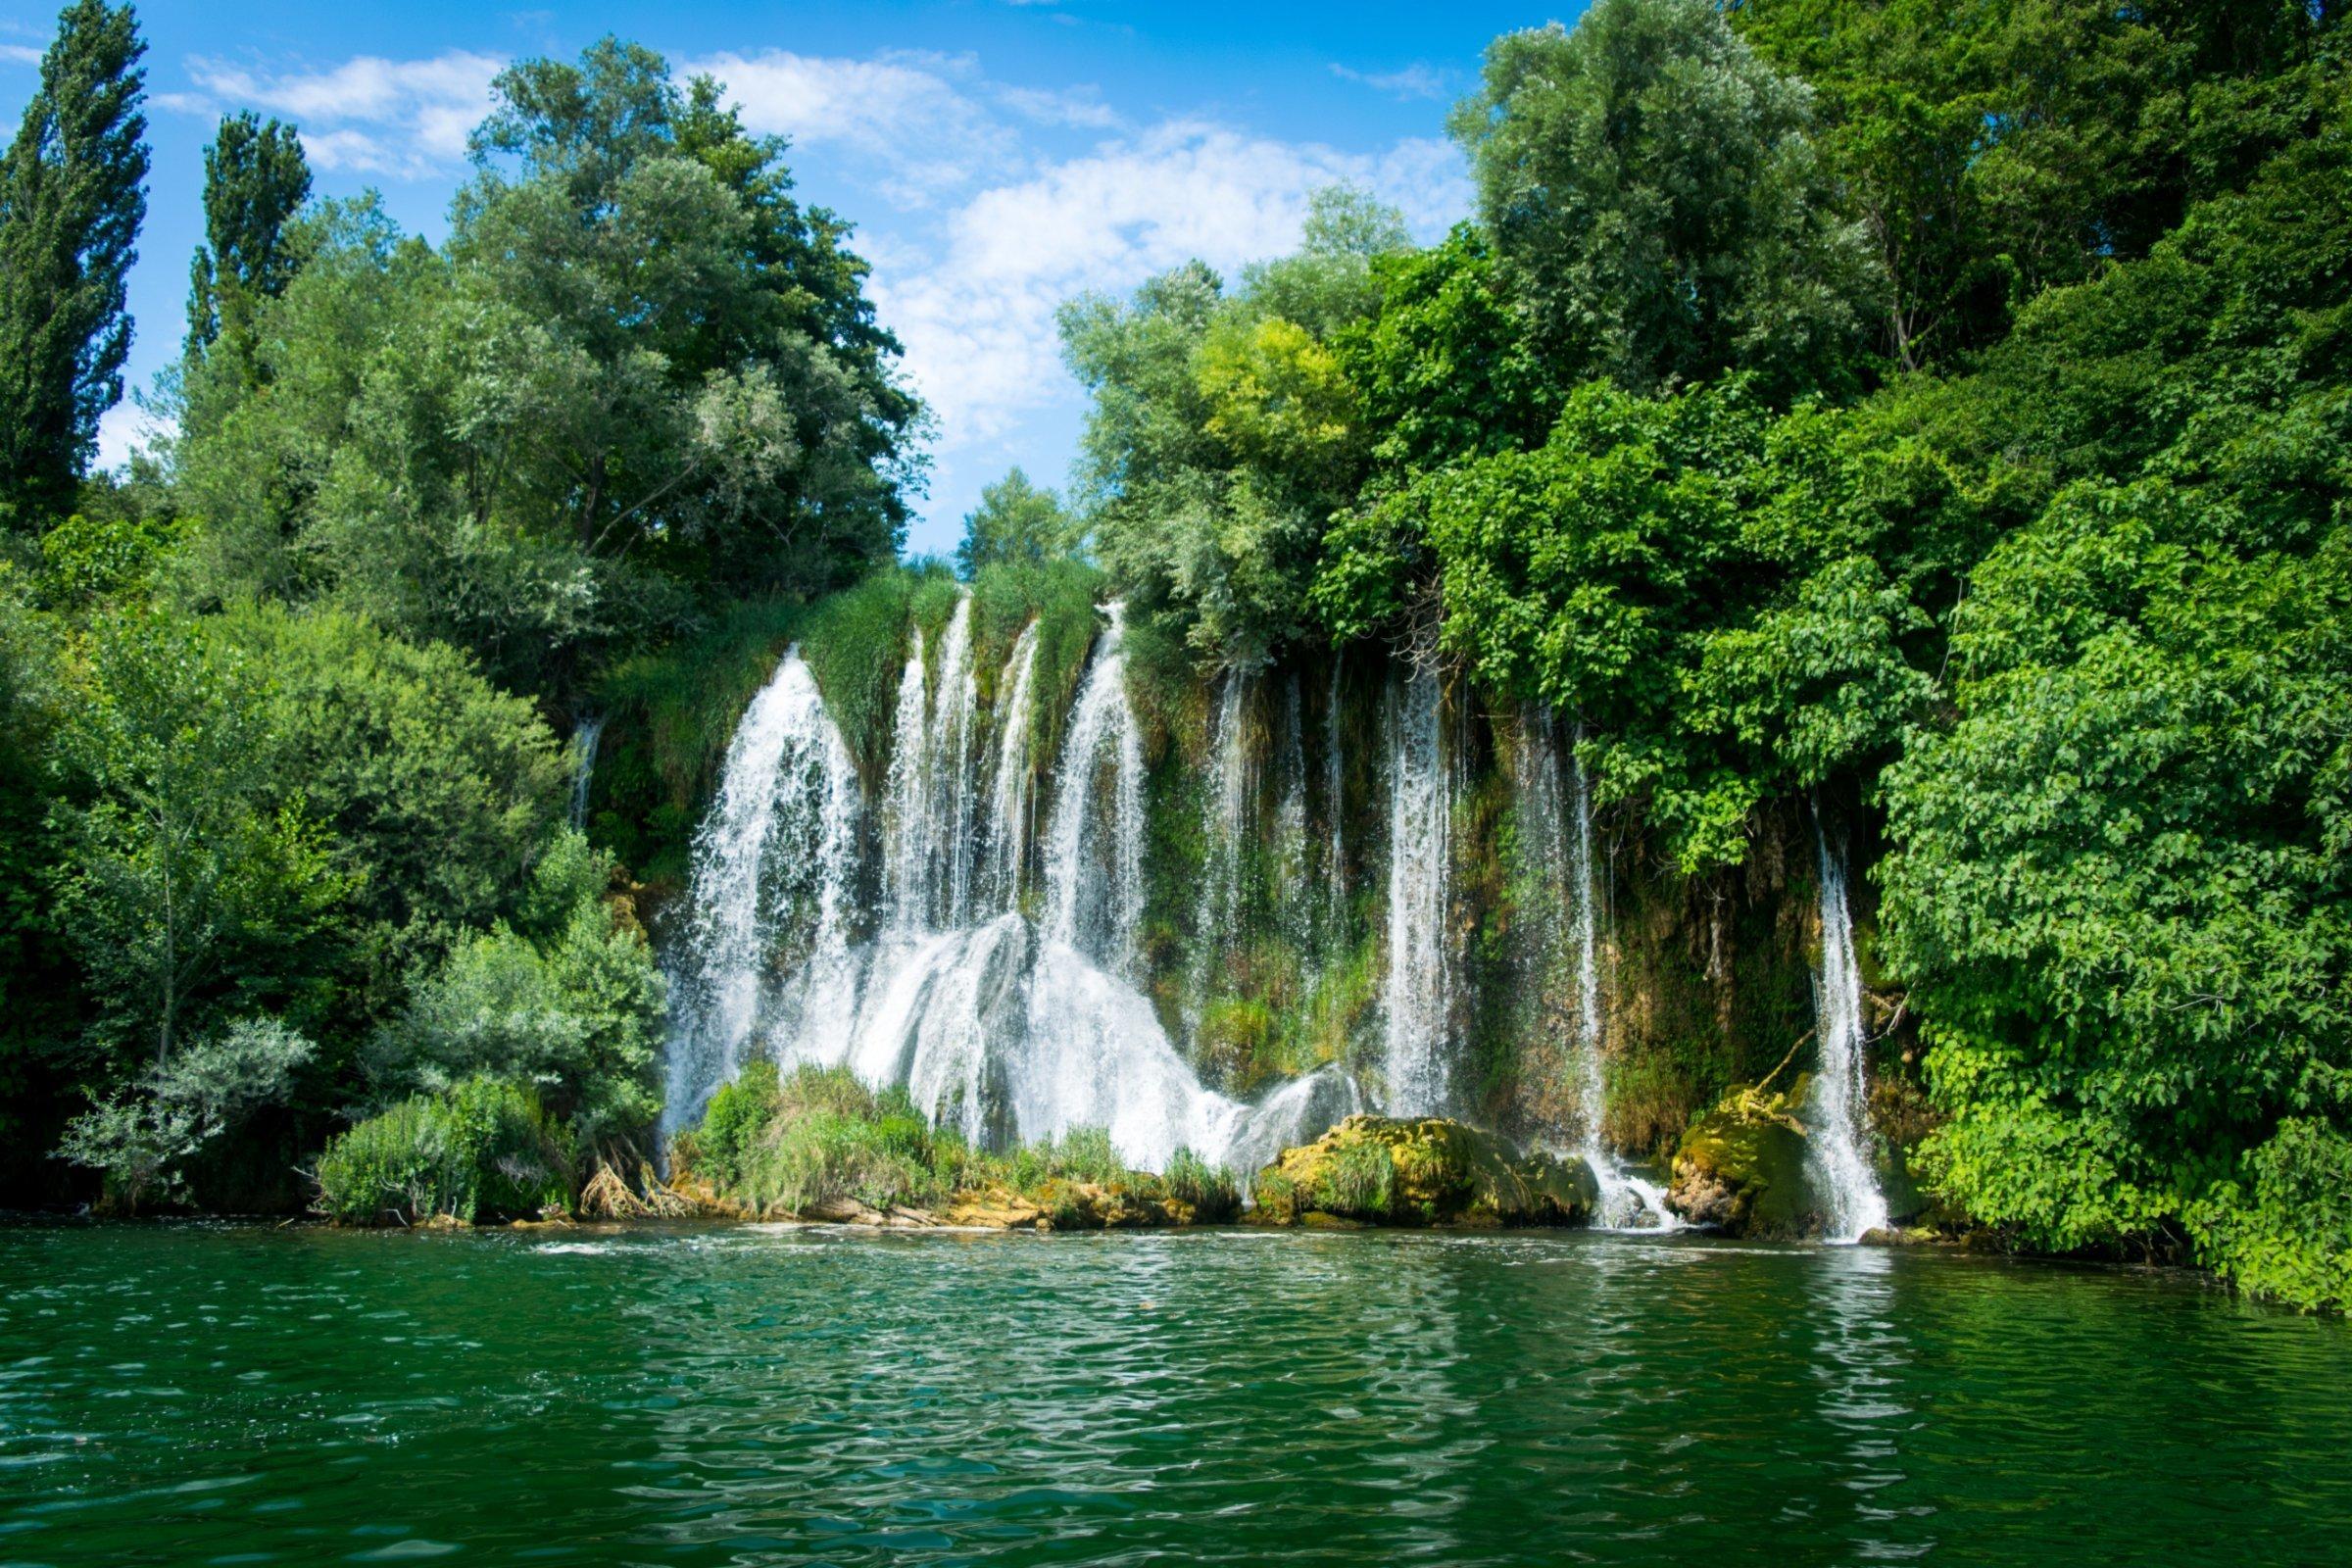 11-Day Best of Slovenia & Croatia - Croatia and Slovenia Itinerary